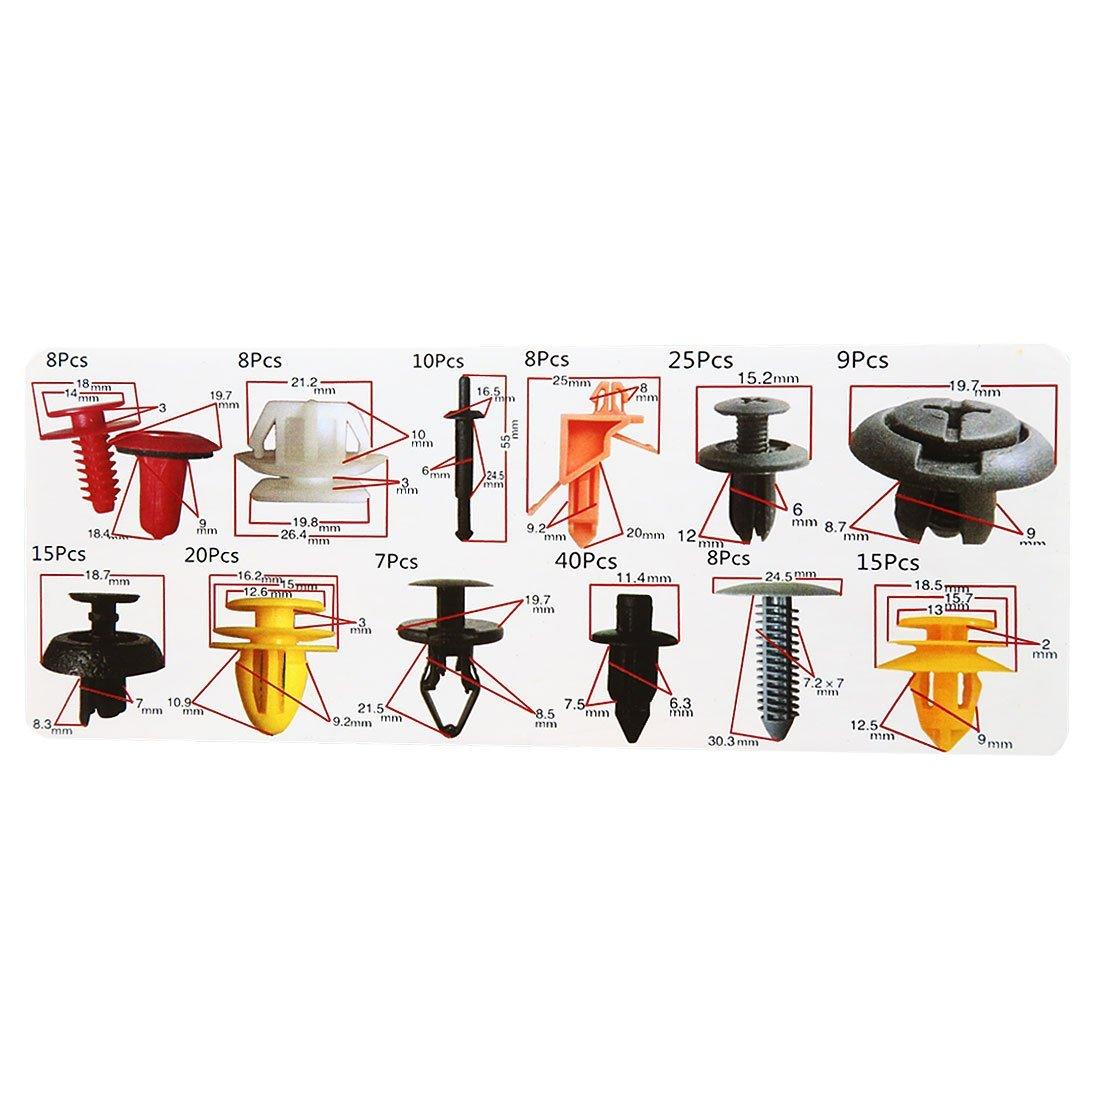 Amazon.com: eDealMax 173 piezas DE 12 Tipo Tornillo, Remache parachoques Fender Splash retenedores Clips Set: Automotive